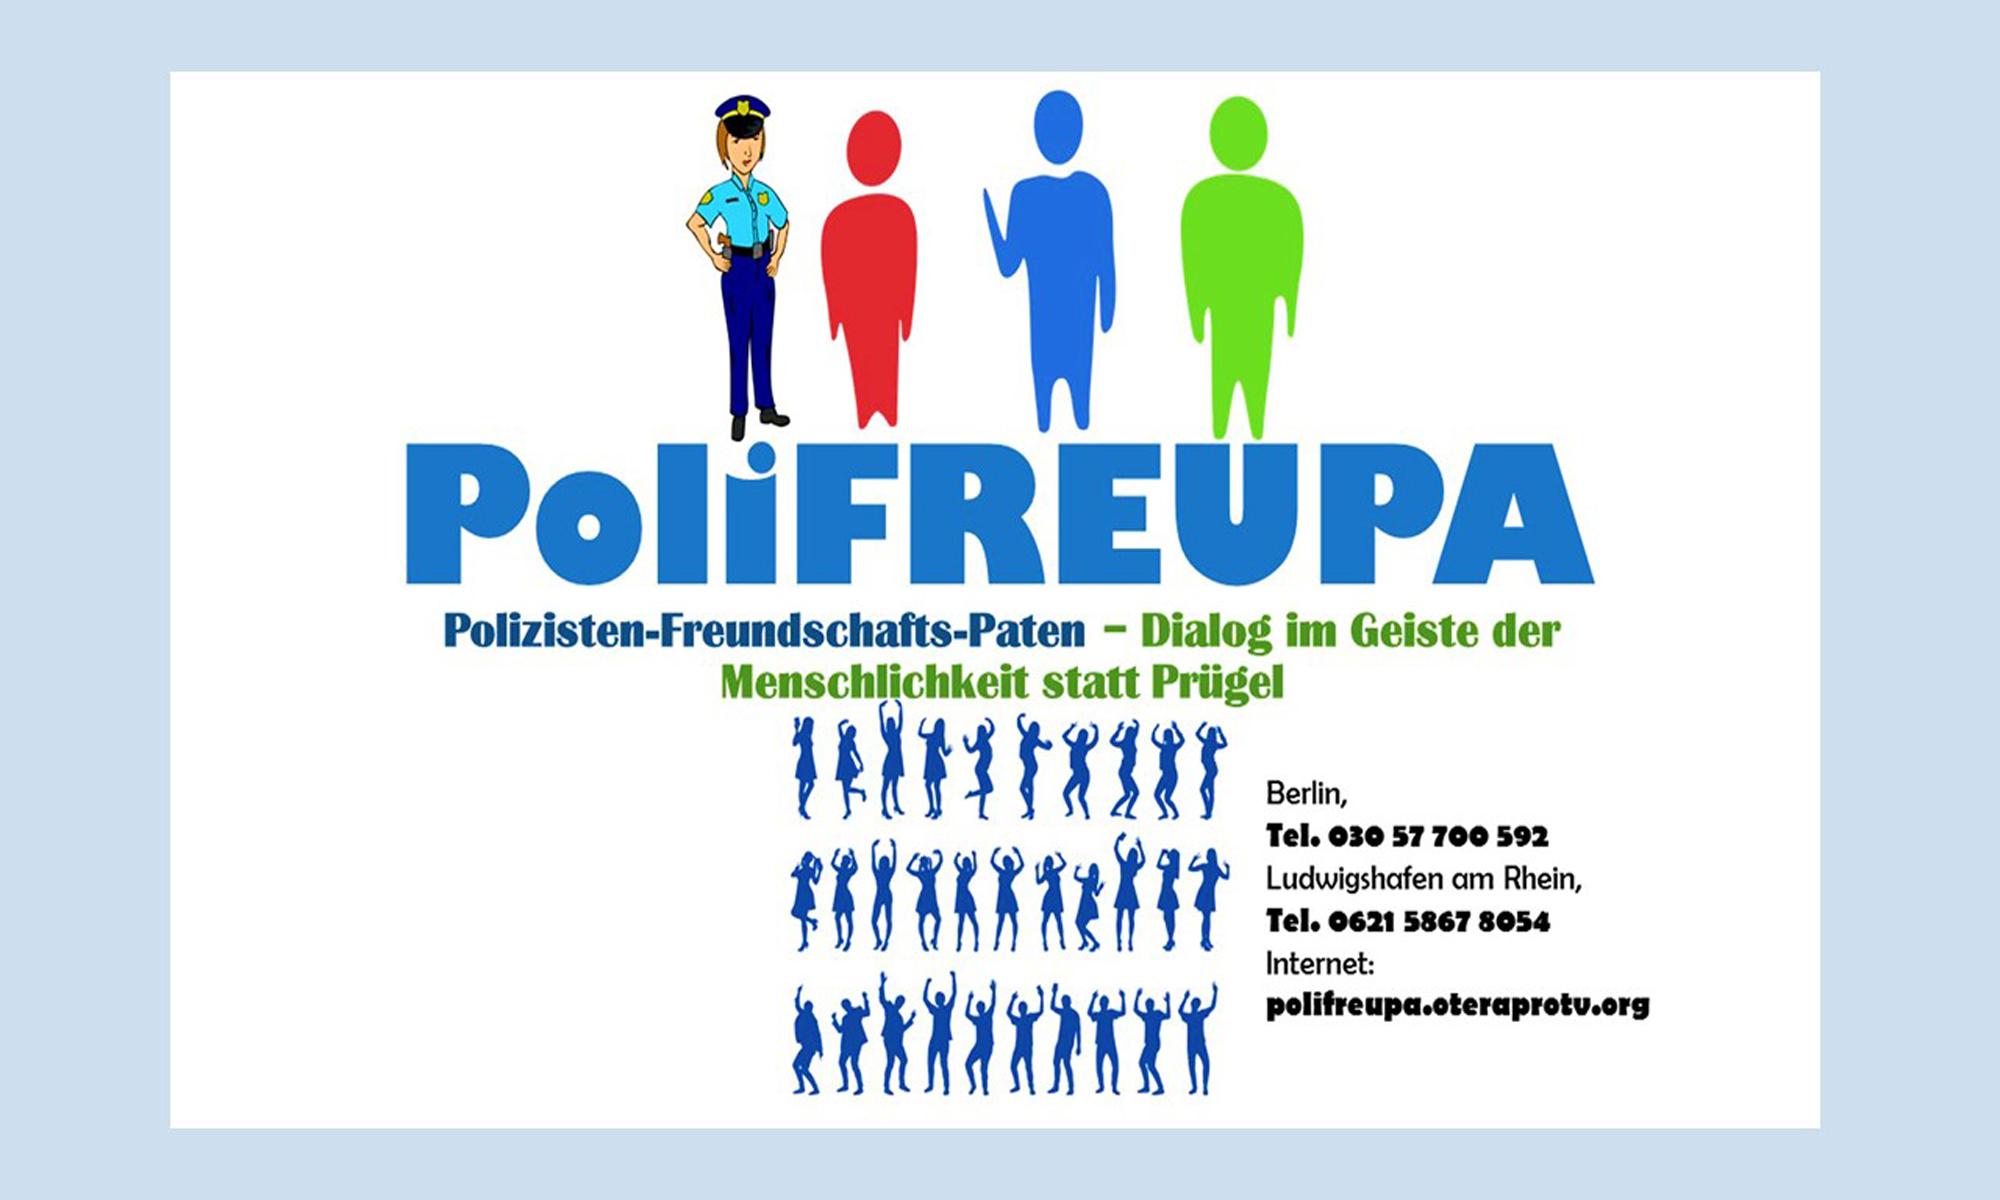 POLIFREUPA